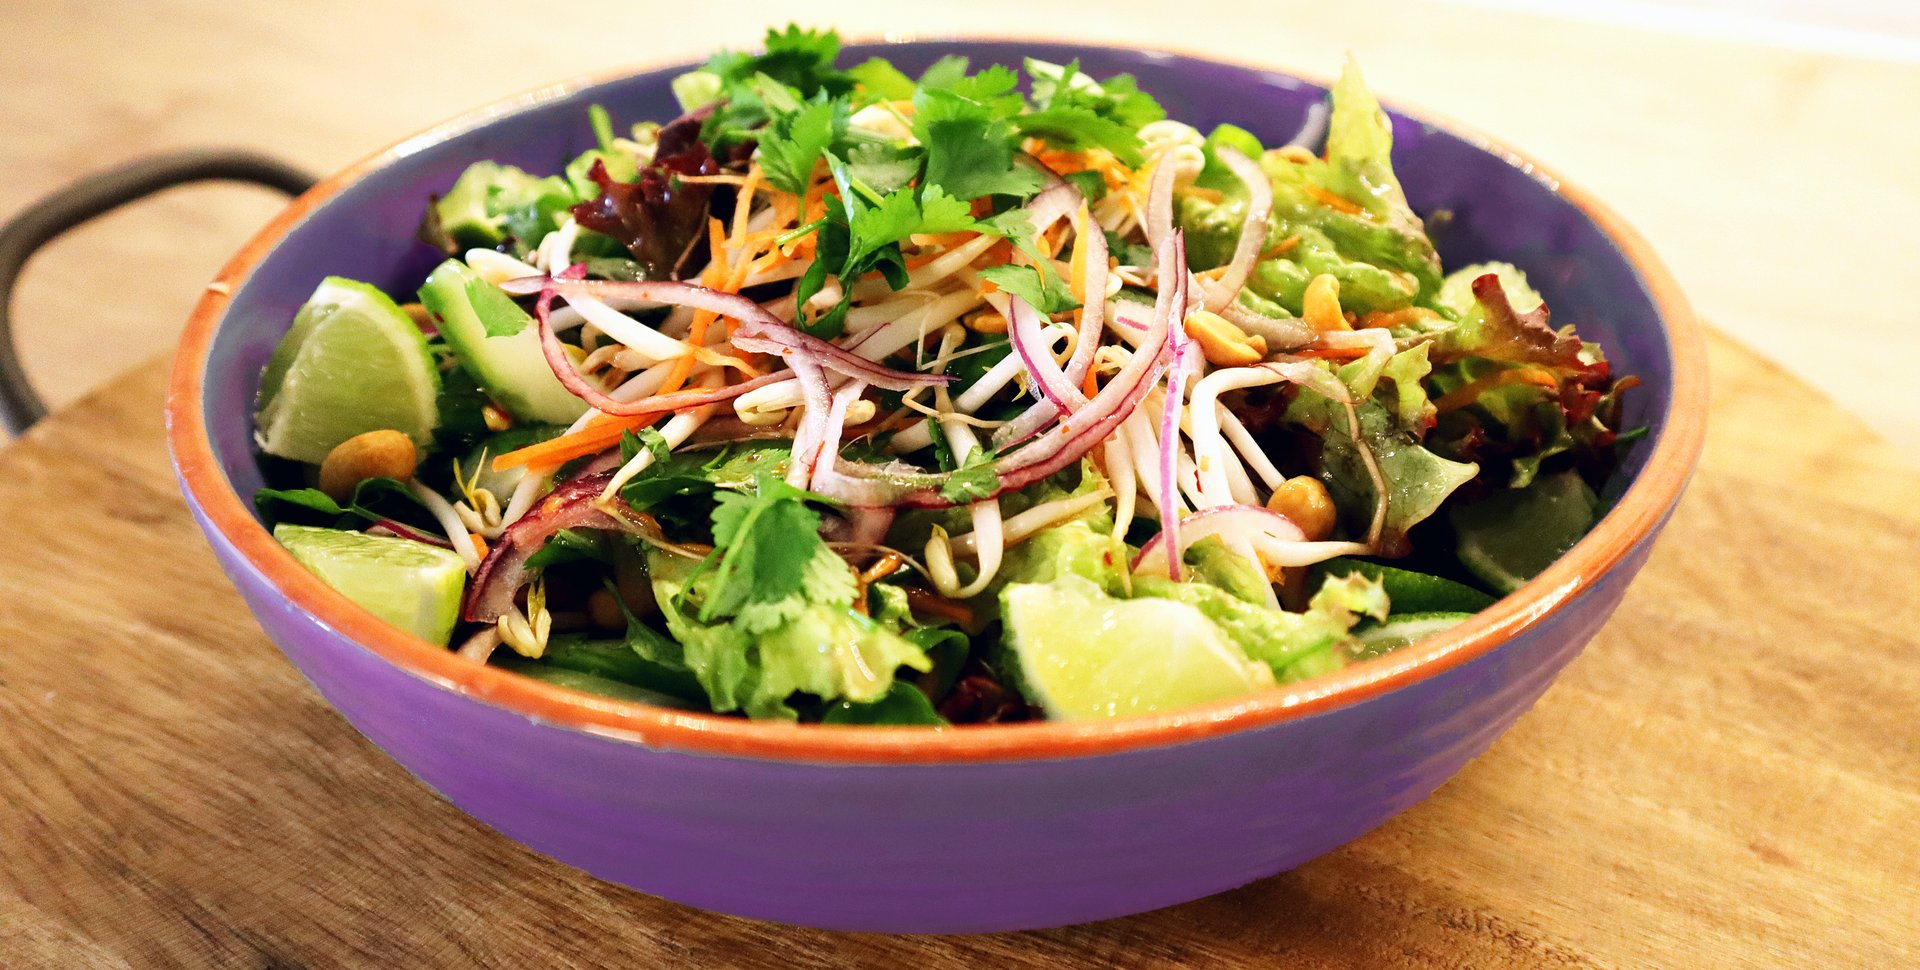 GT_Crispy-Vietnamese-Salade_0155.jpg